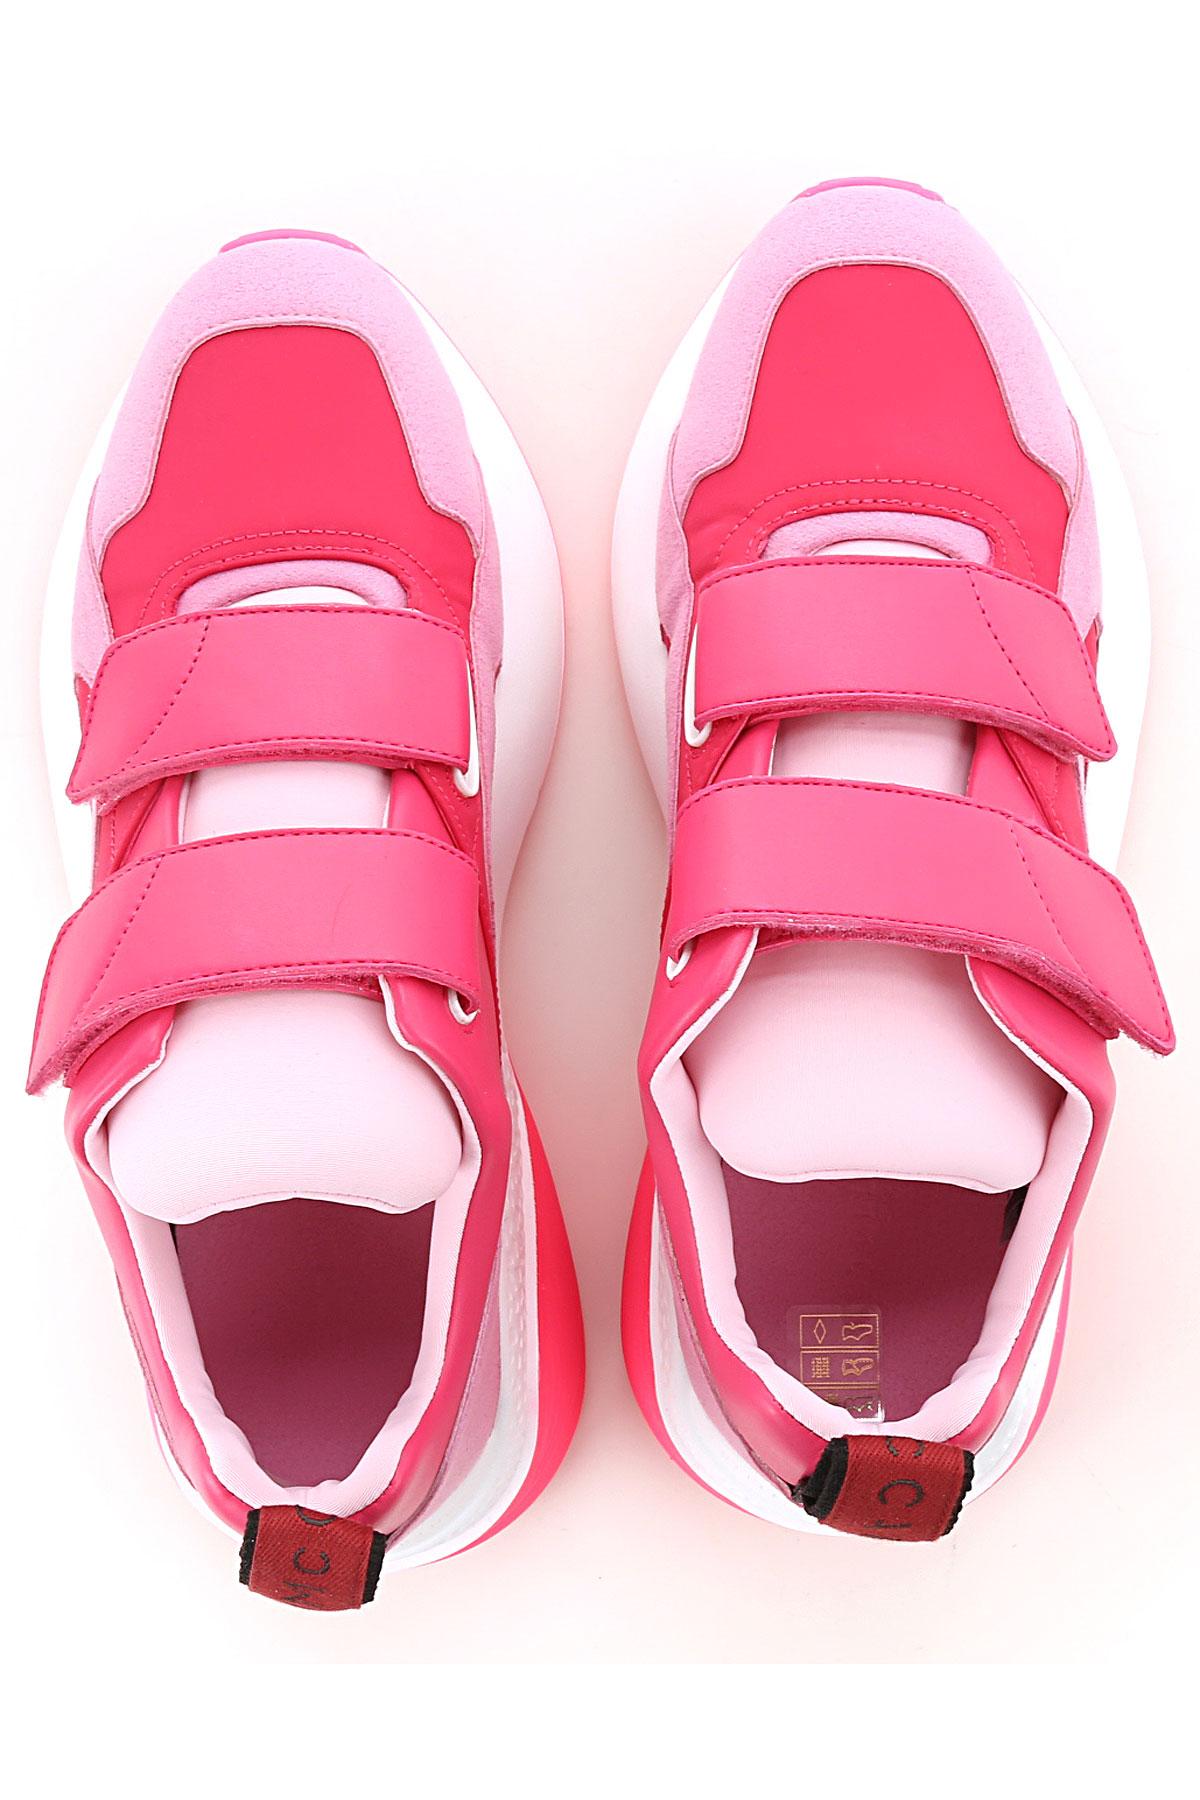 Stella Fucsia Primavera 2019 verano nbsp; Zapatos Mccartney Mujer Para BWrB10